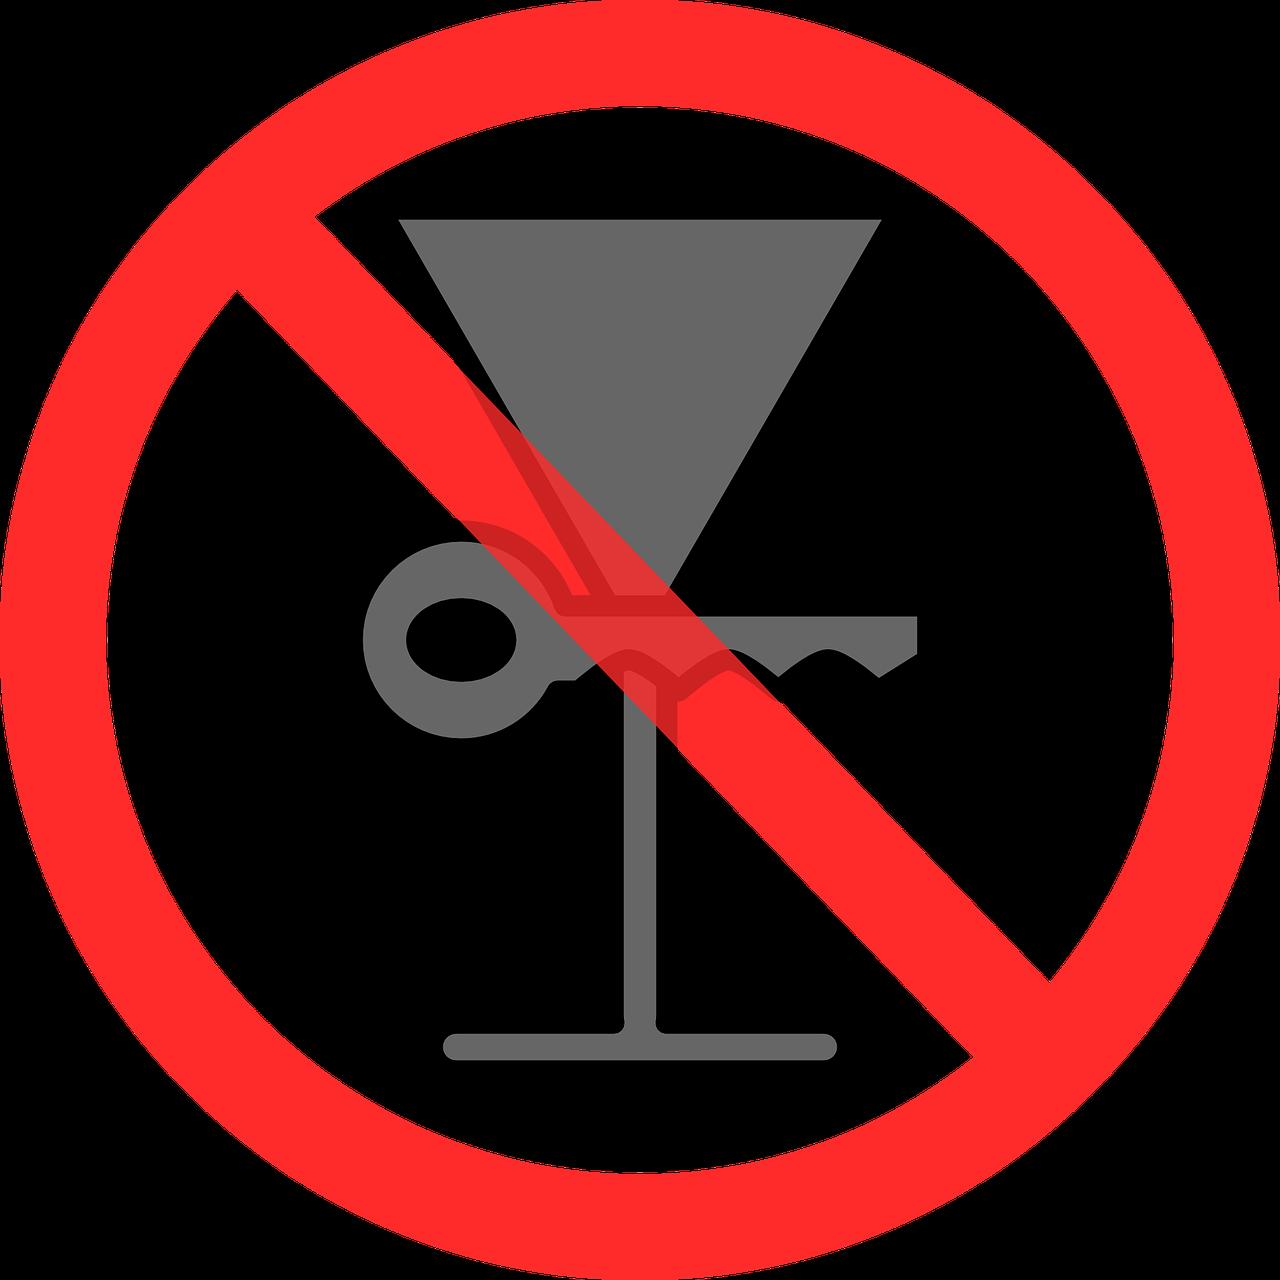 drunk-driving-40574_1280